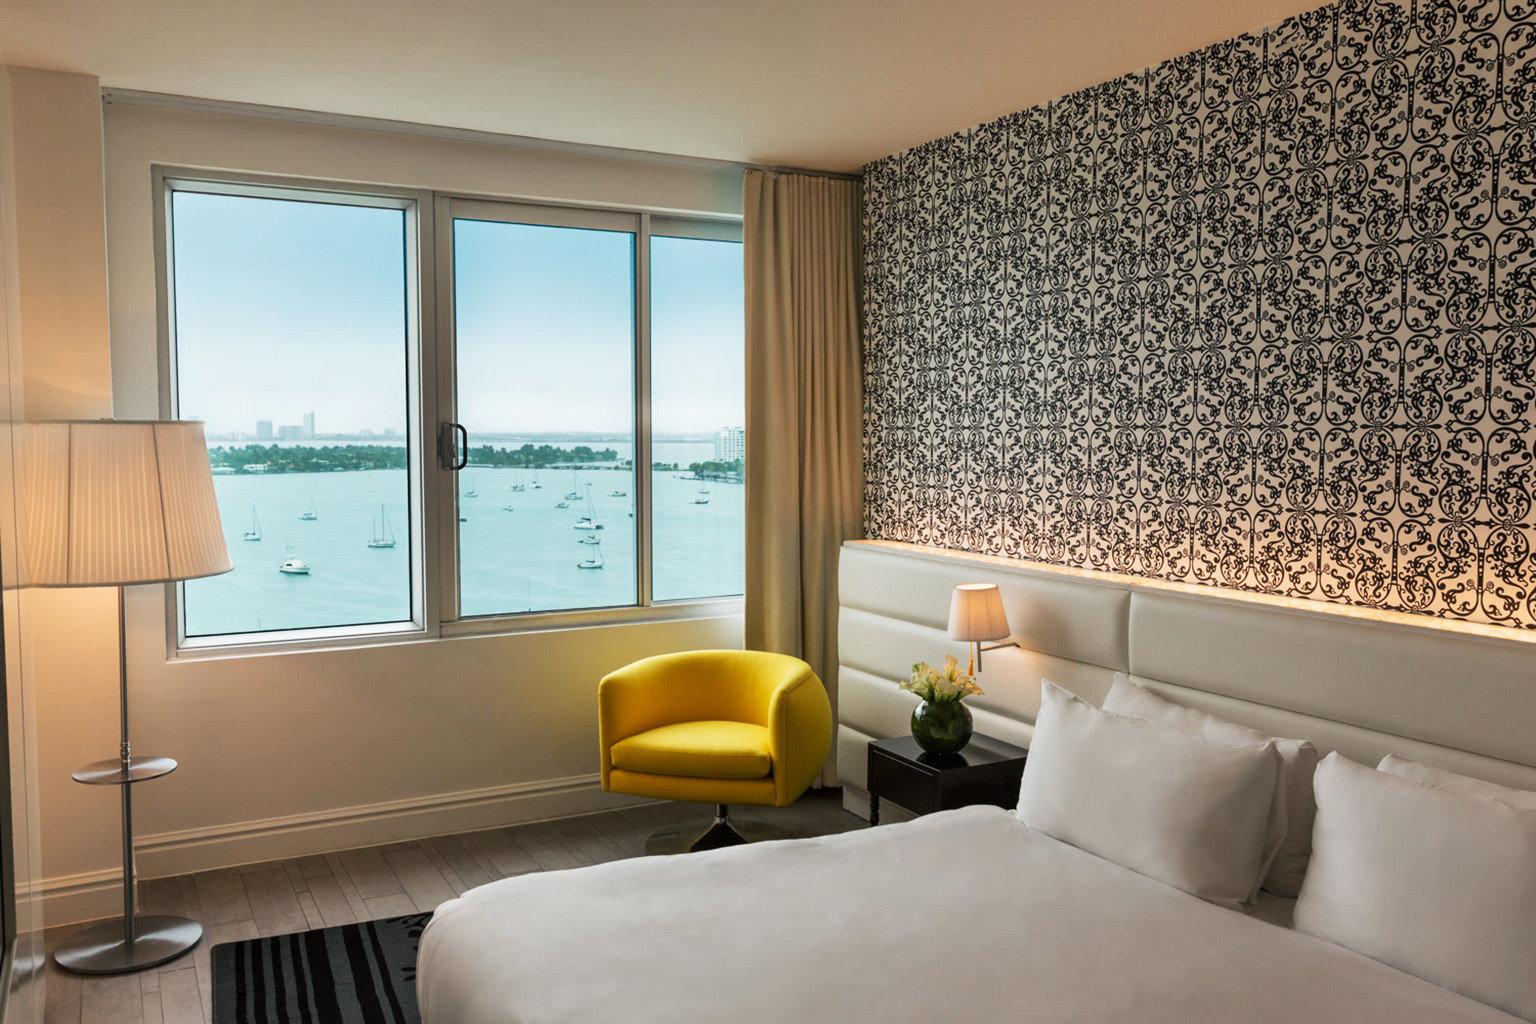 Bedroom Modern Resort Scenic views property Suite condominium white living room pillow nice flat